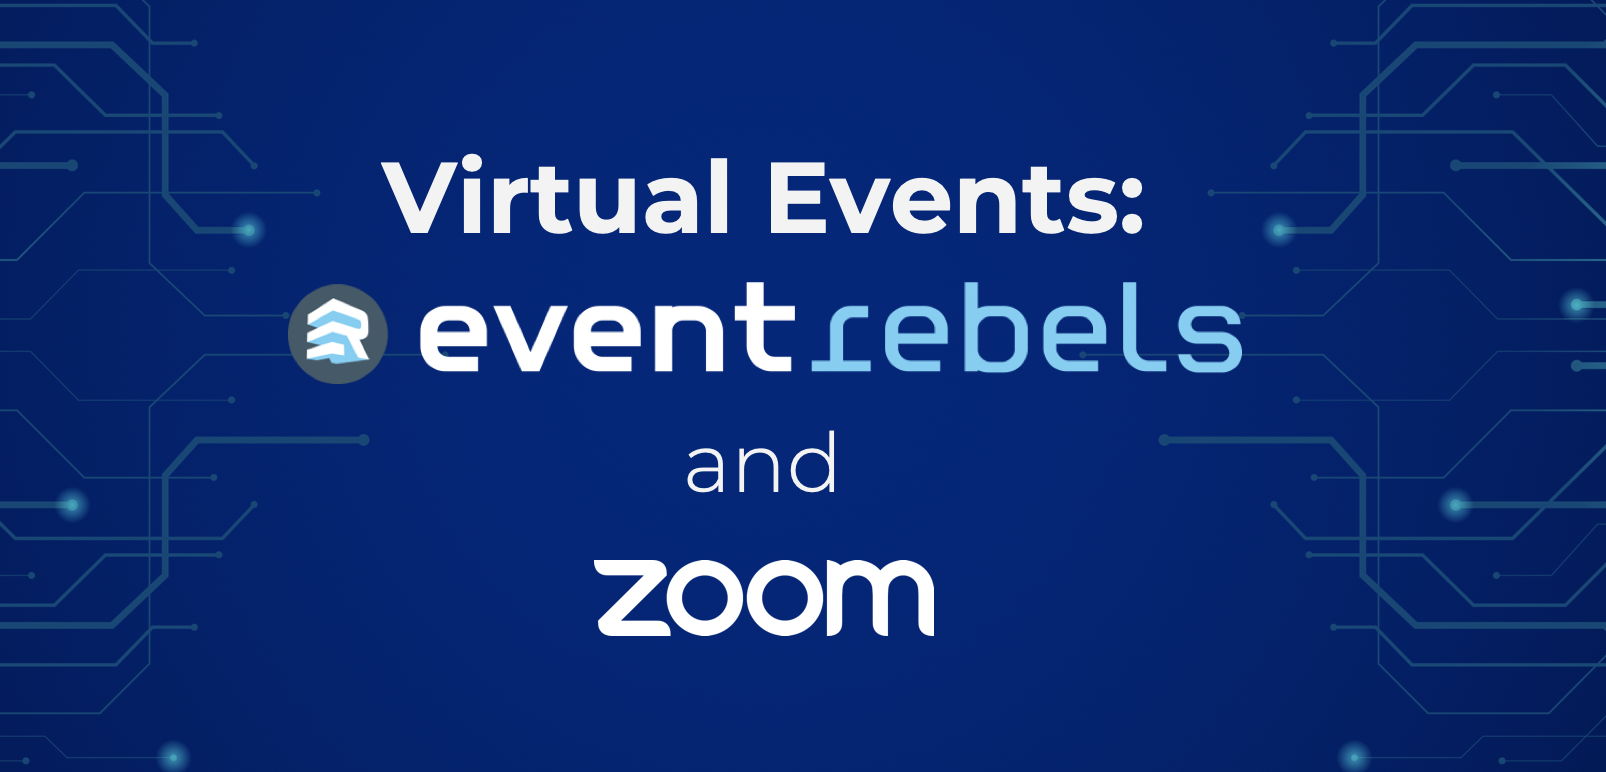 VirtualEventsZoomEventRebels